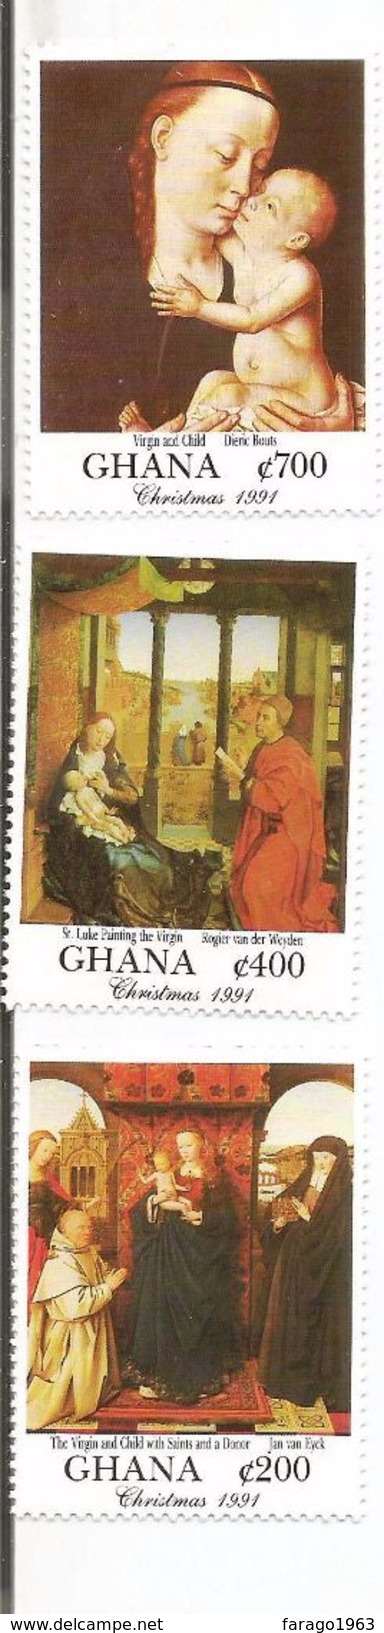 1991 Ghana Art Christmas Paintings Complete Set Of 8  MNH - Ghana (1957-...)